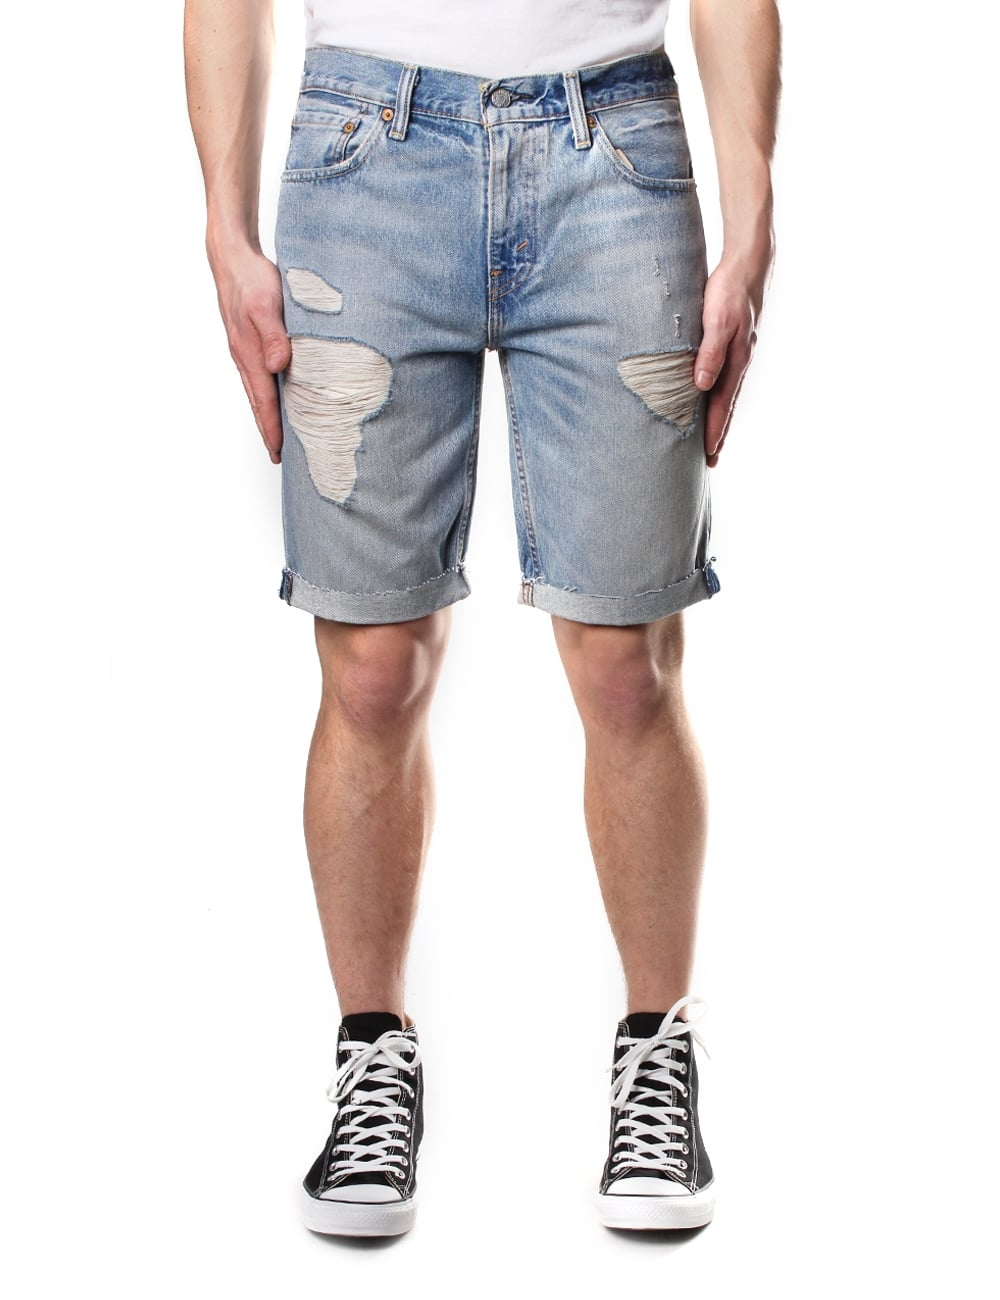 68c20951 Levi's 511 Slim Fit Men's Cut Off Shorts